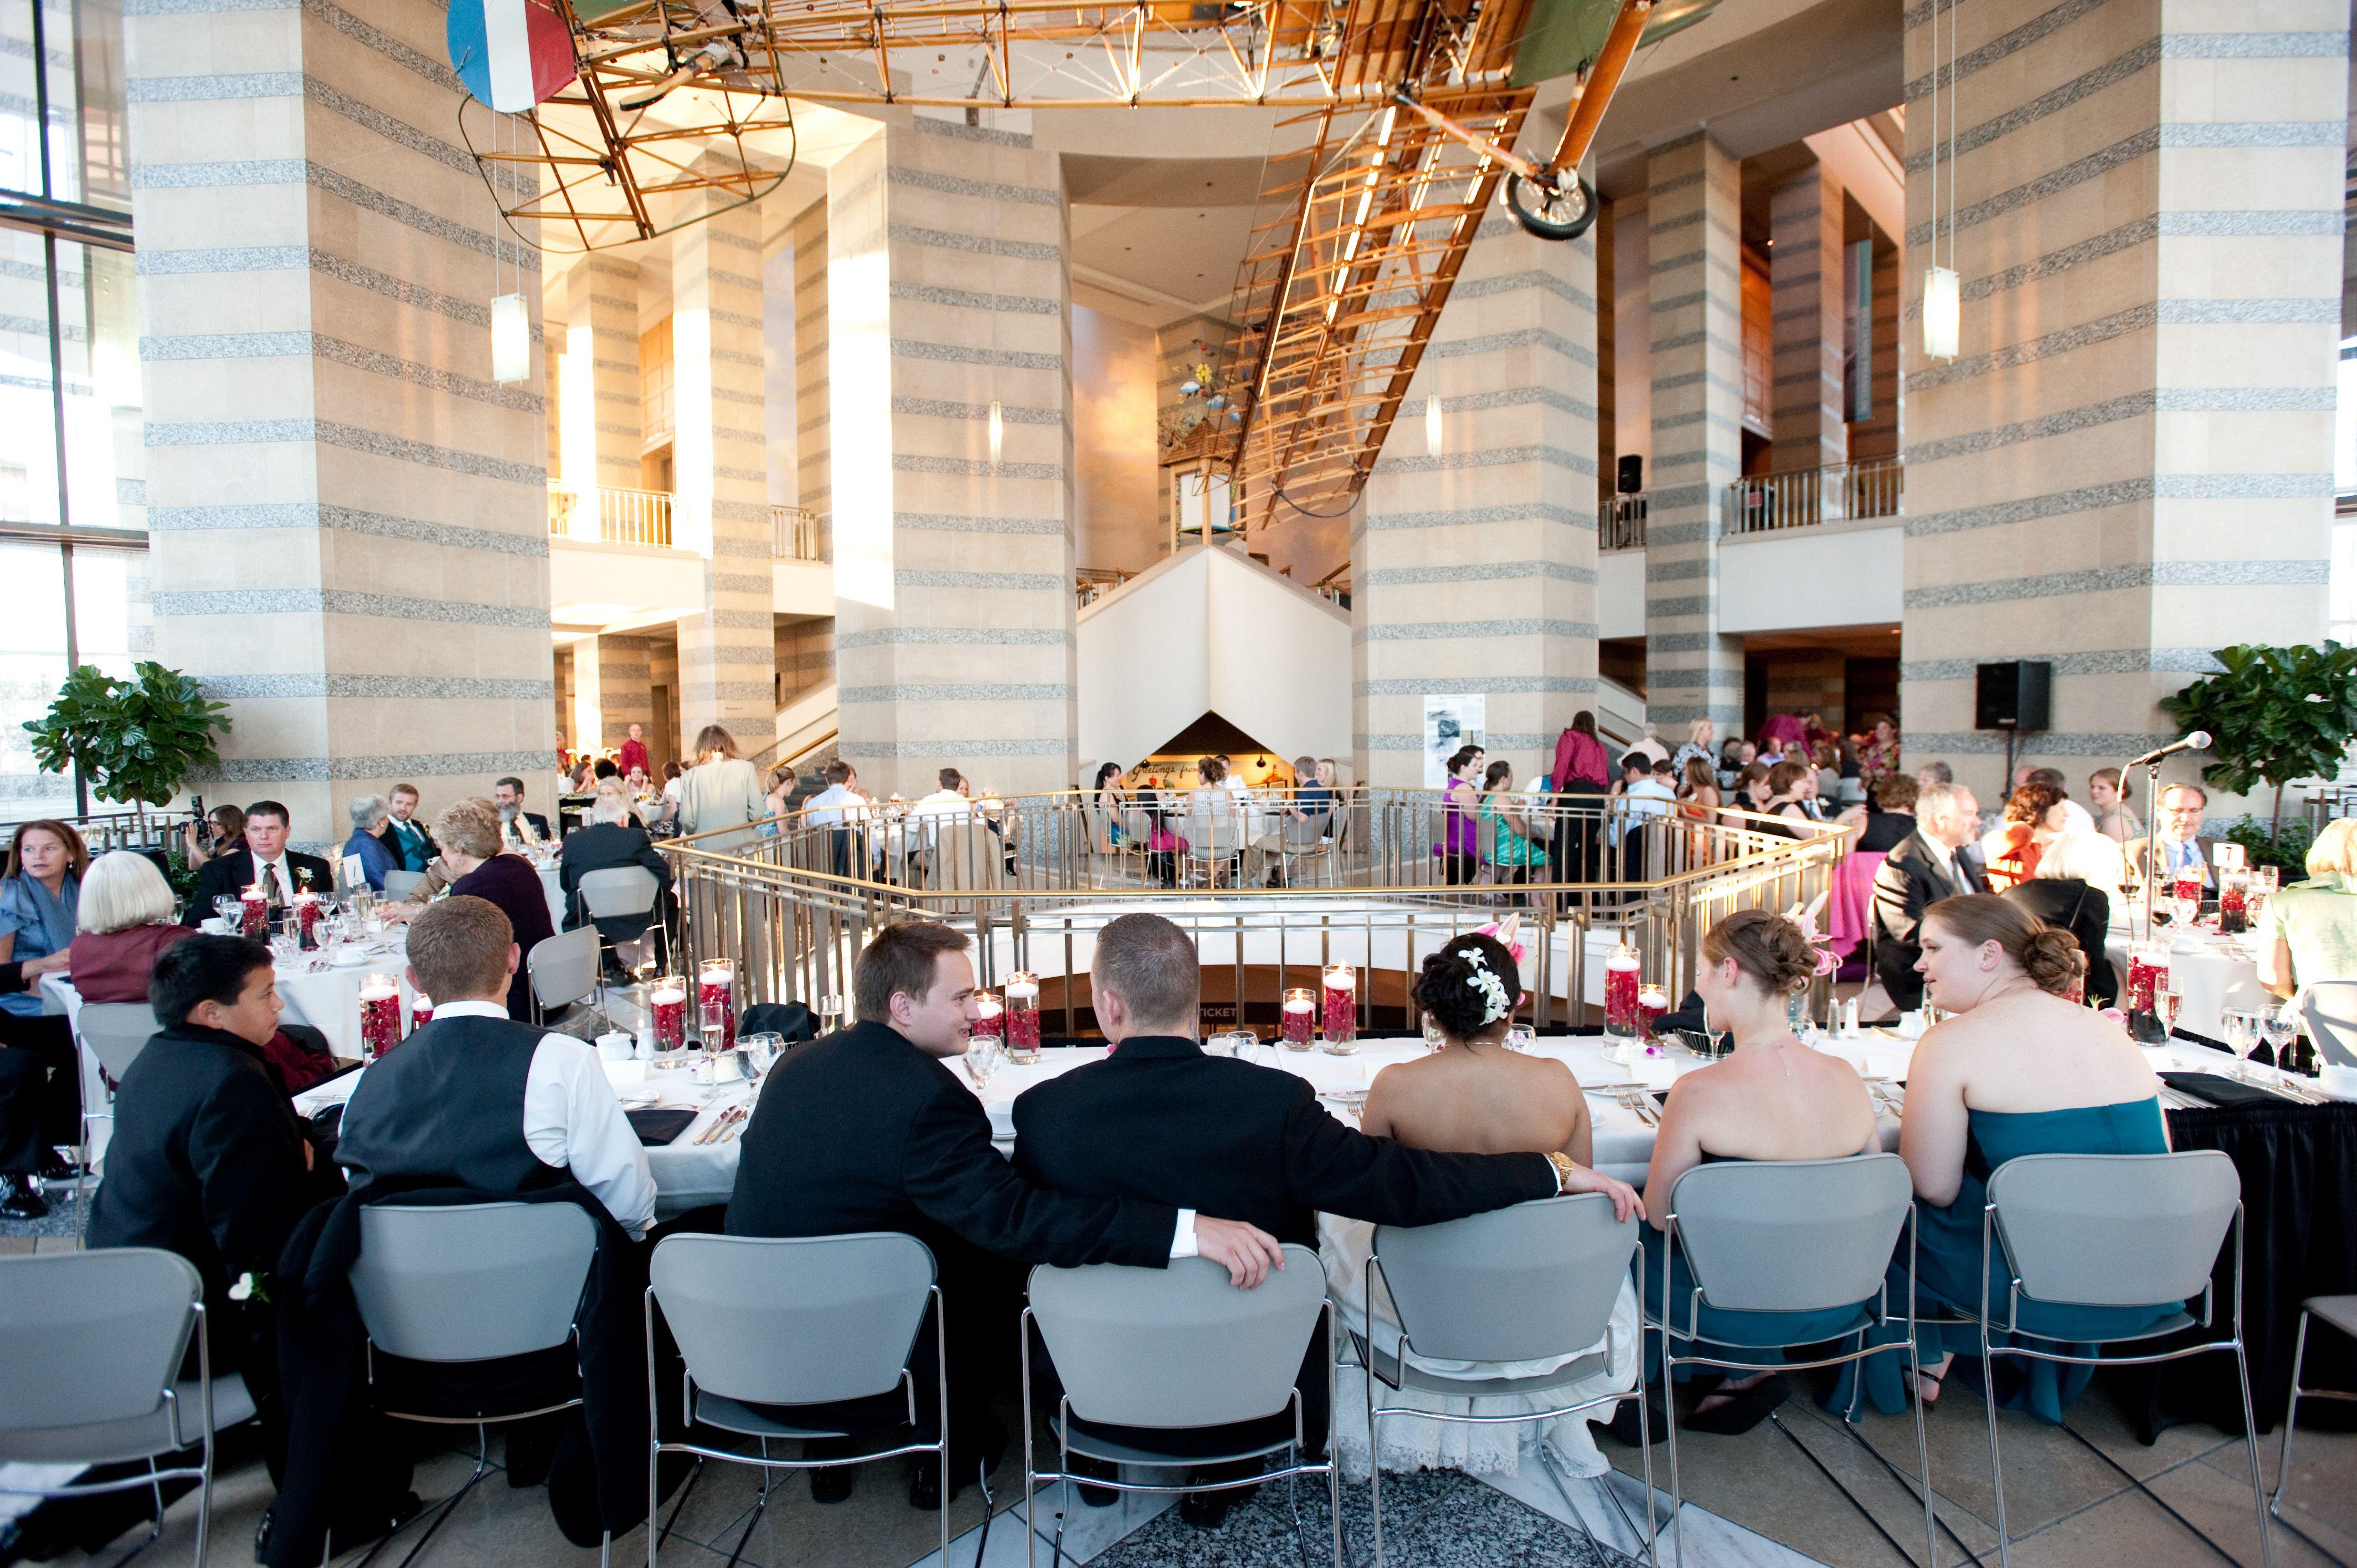 wedding halls st paul mn%0A Minnesota History Center Wedding   Minnesota History Center Wedding    Pinterest   Minnesota  Wedding planners and Wedding